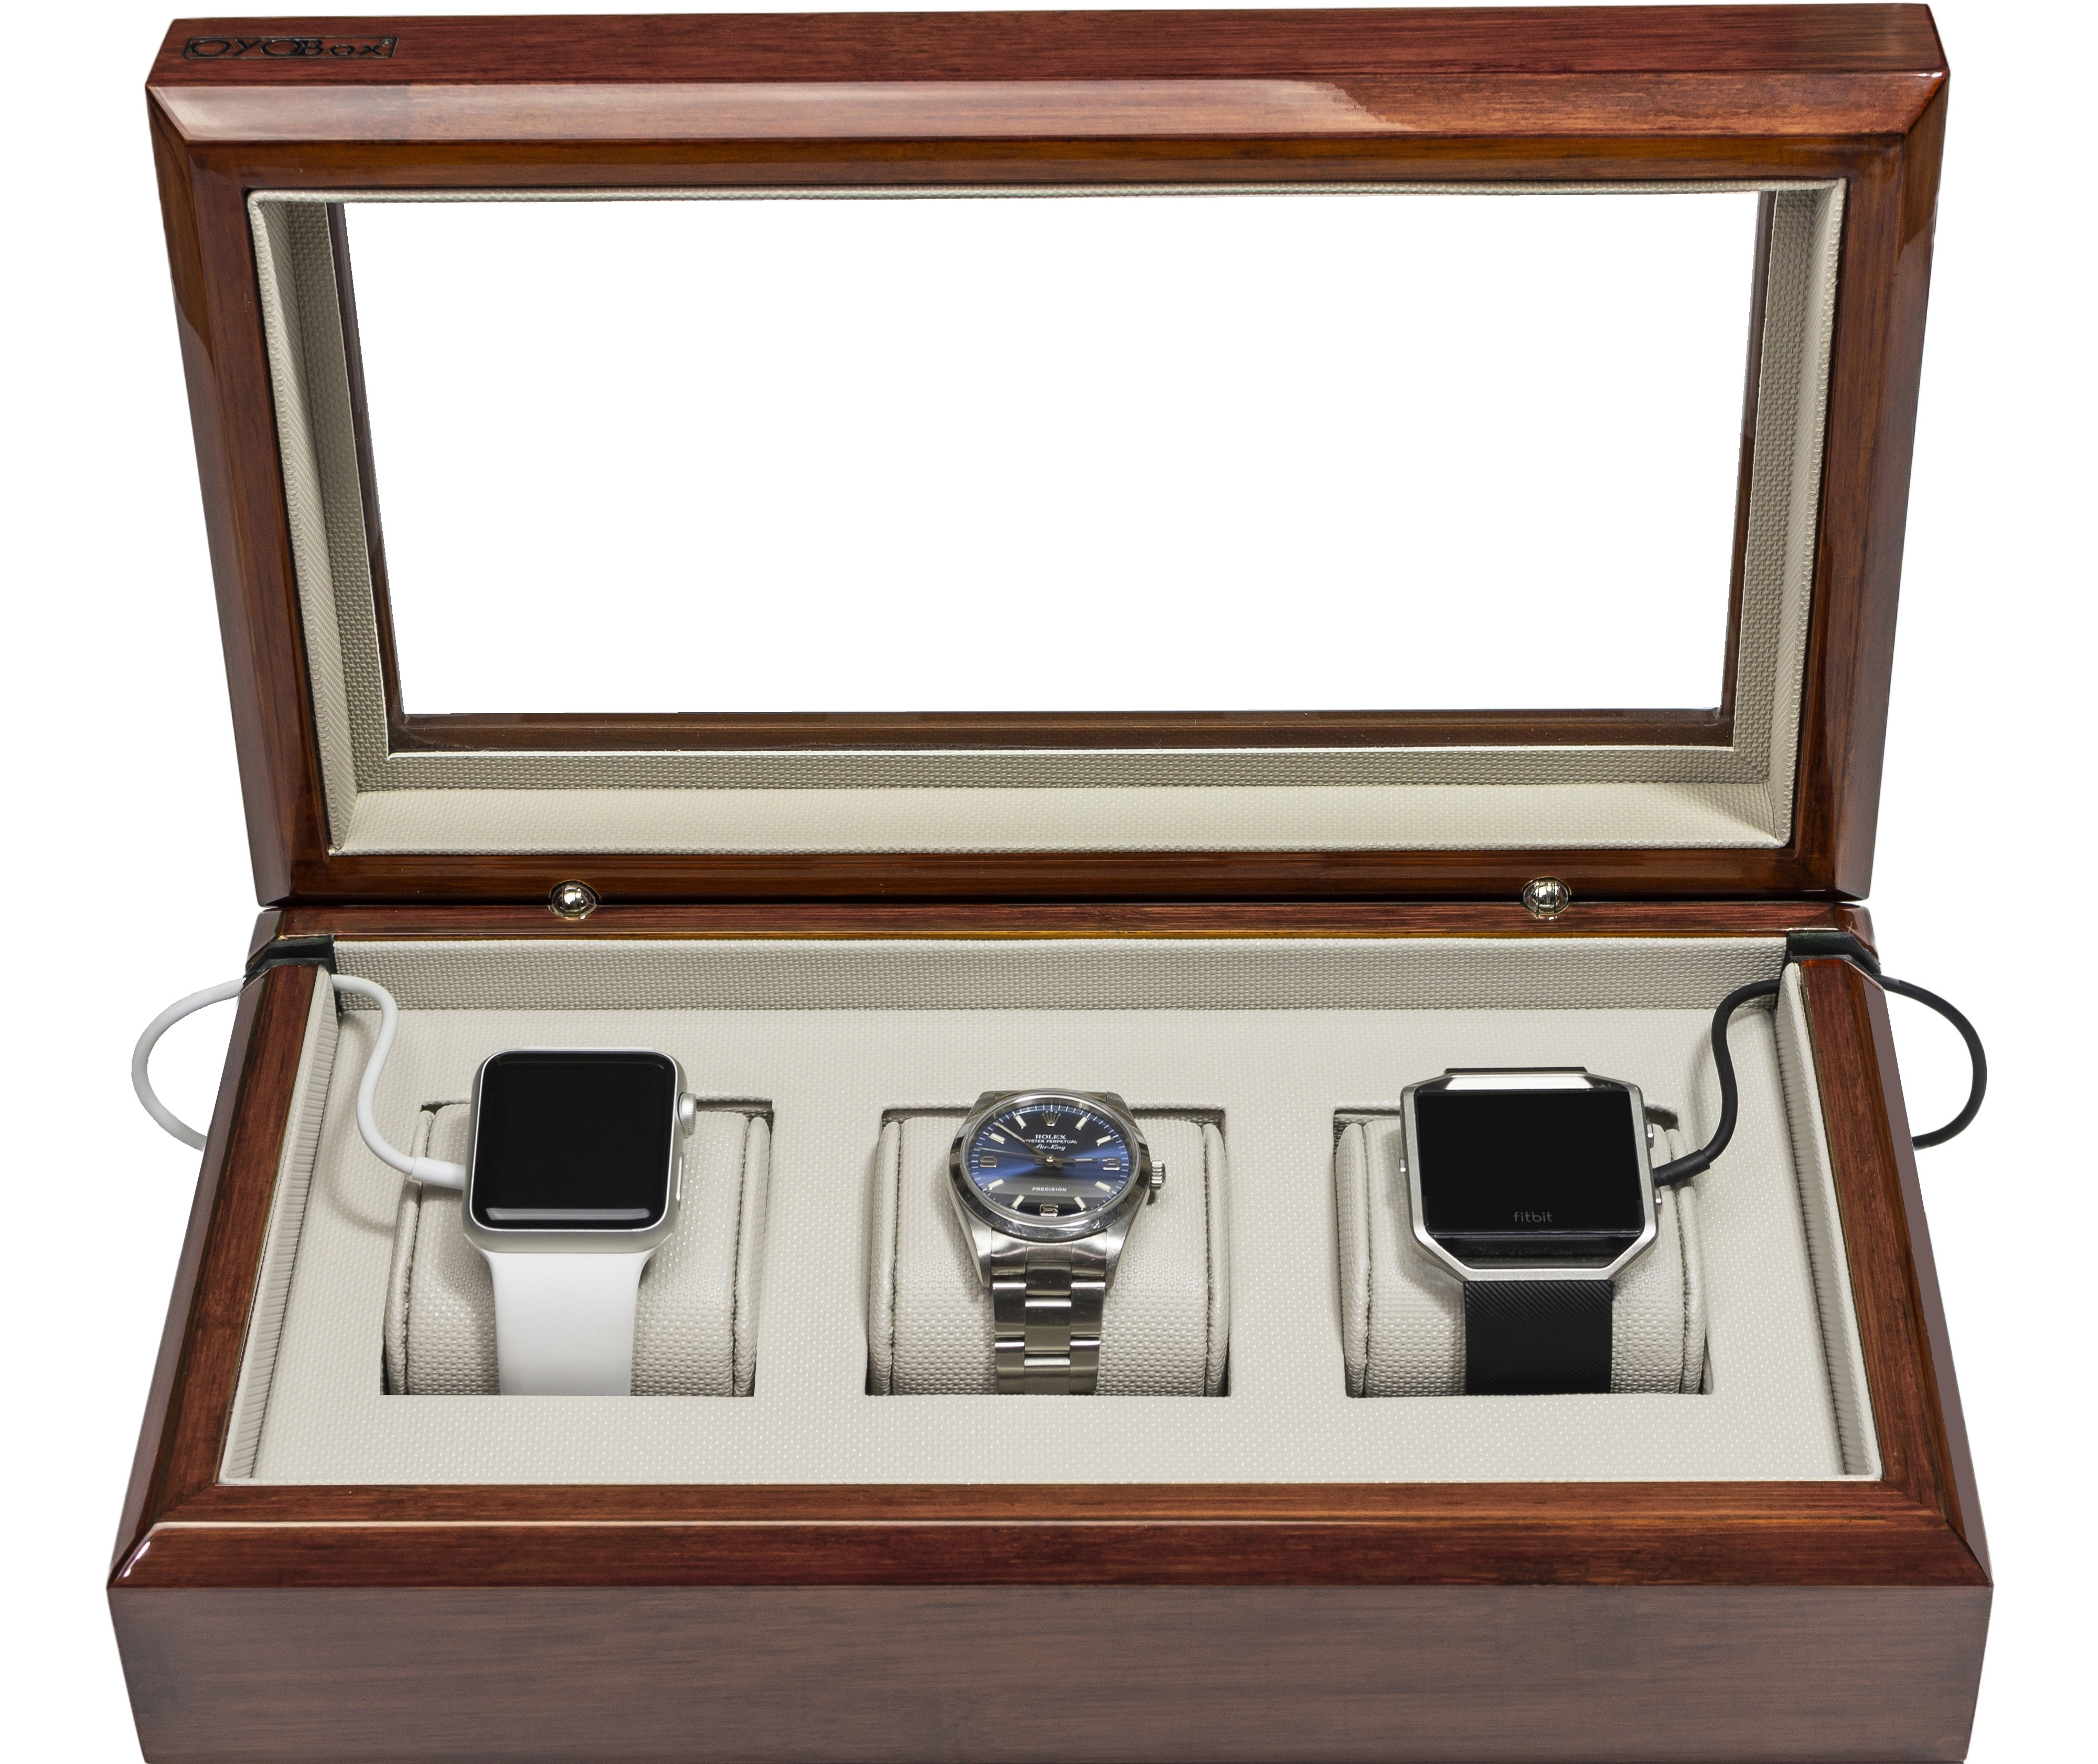 Mahogany Smart-Watch Box